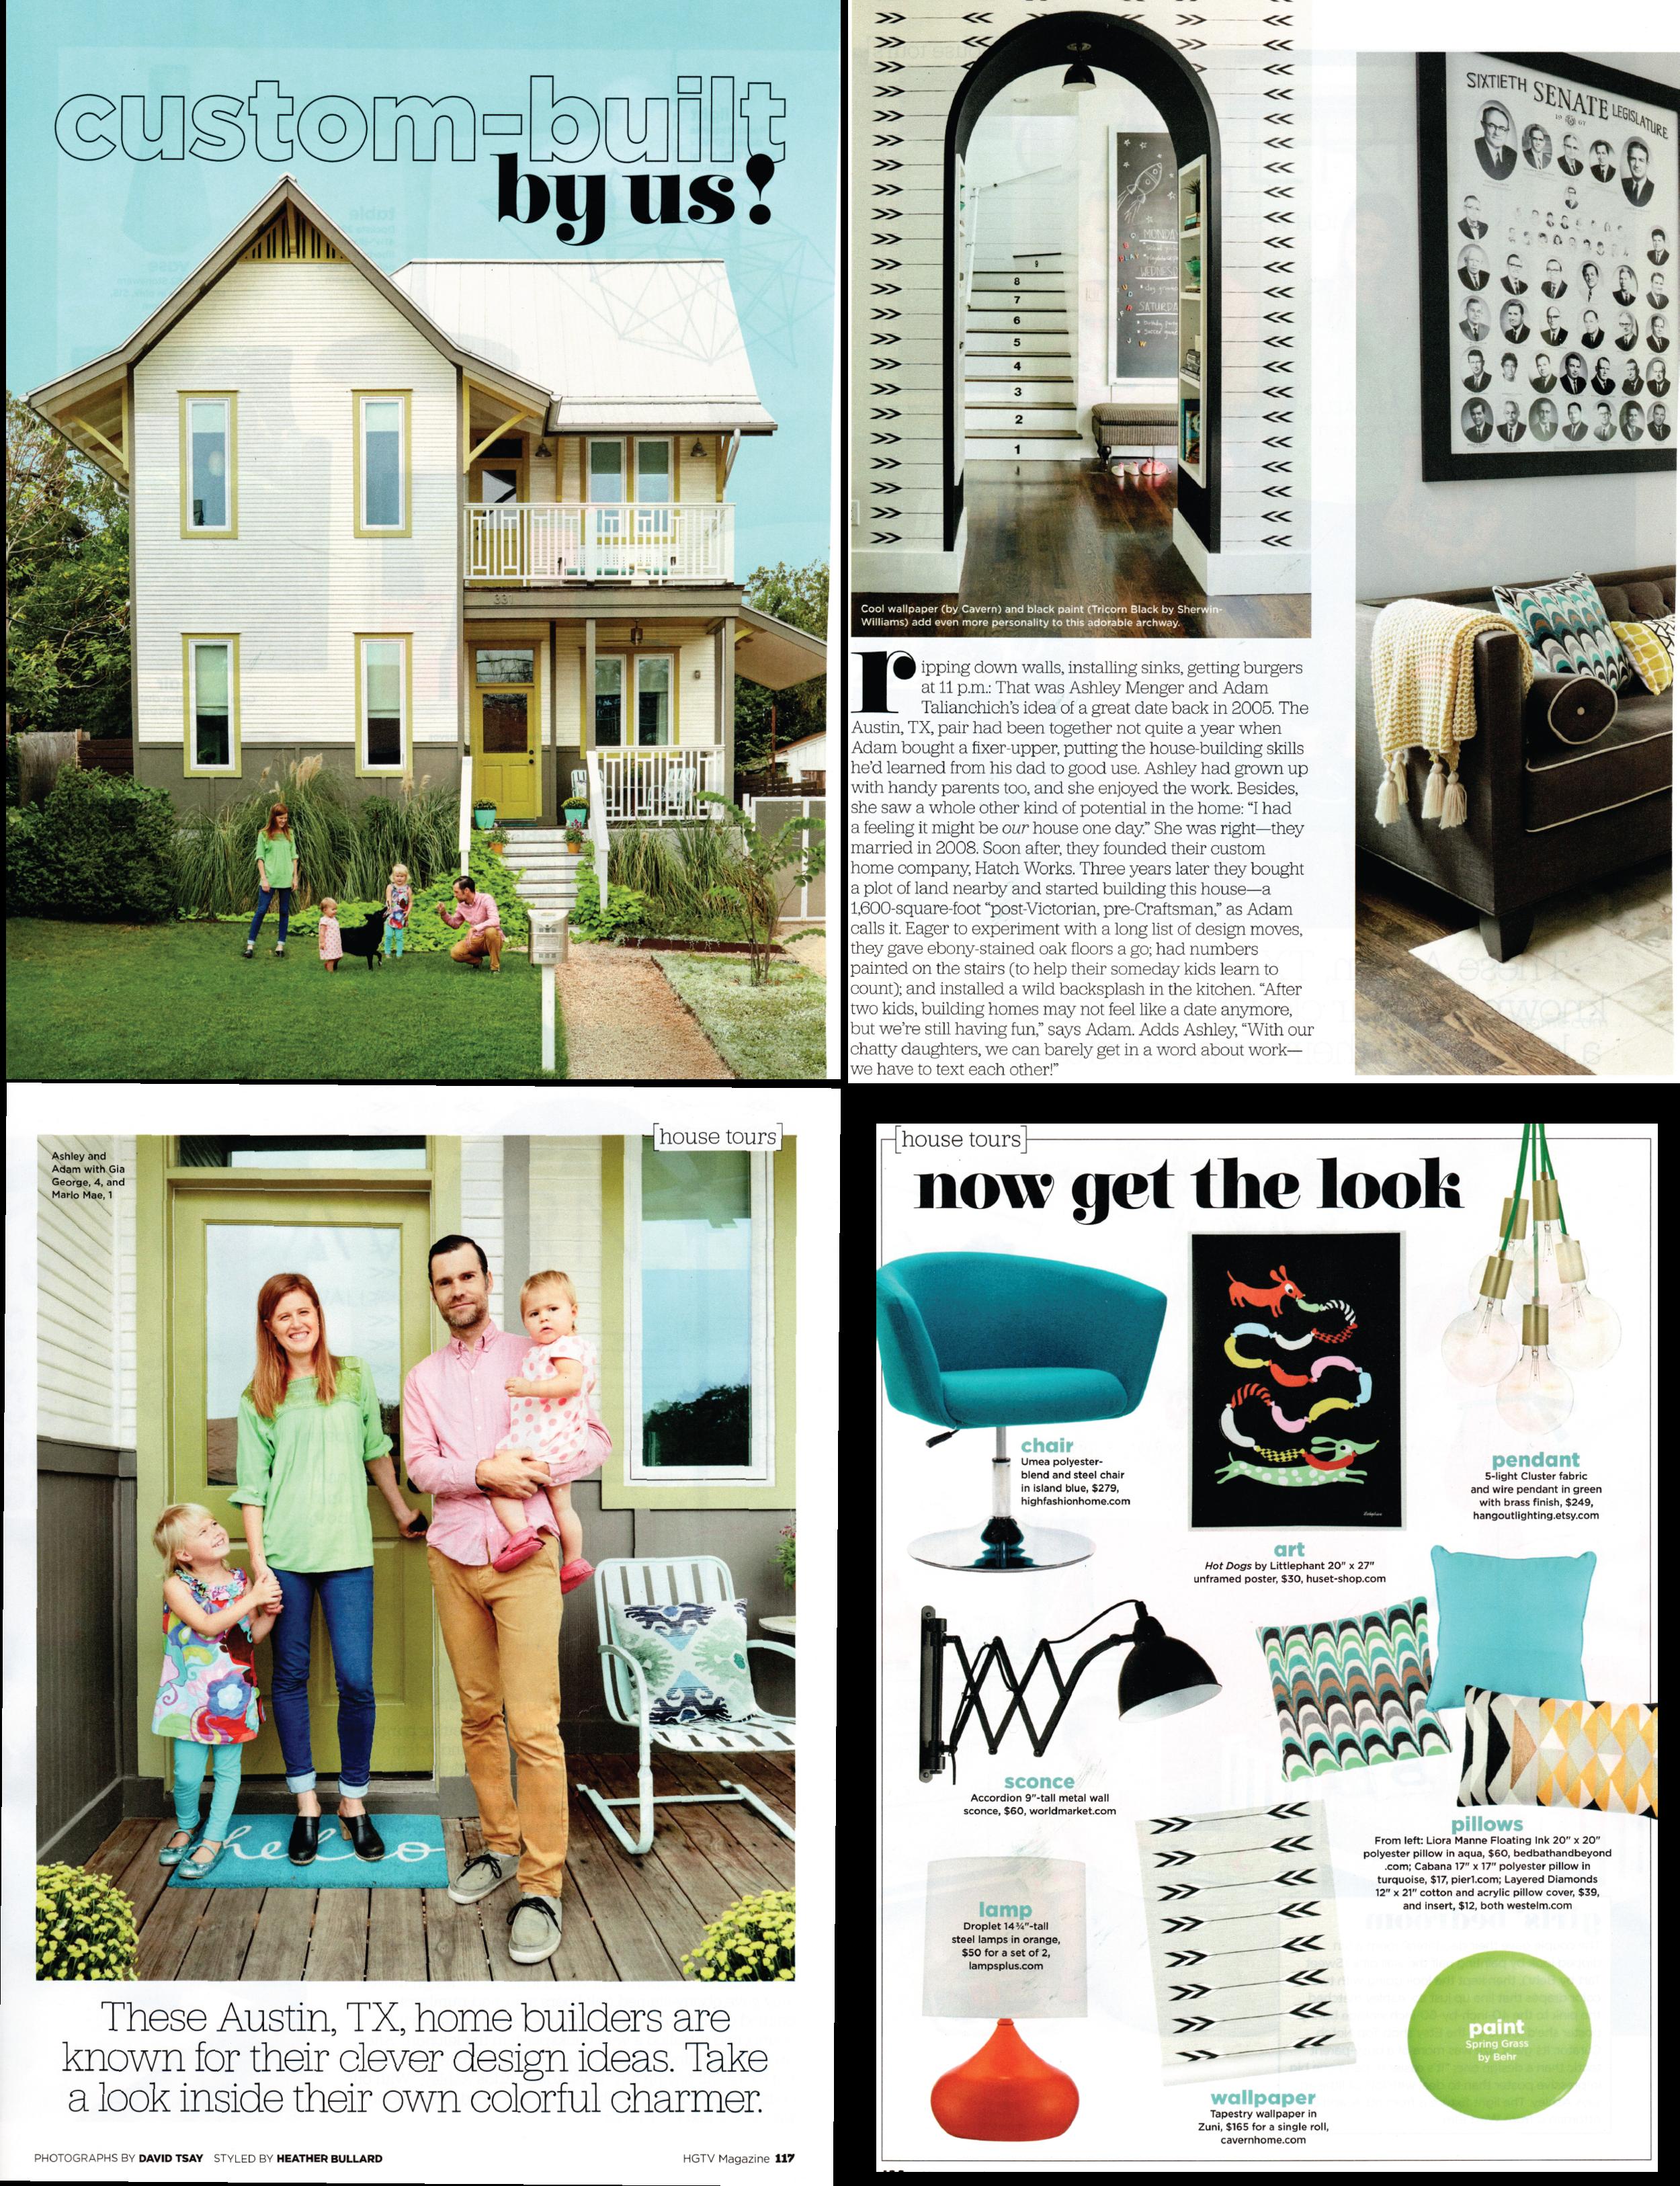 HGTV Magazine — Cavern Home